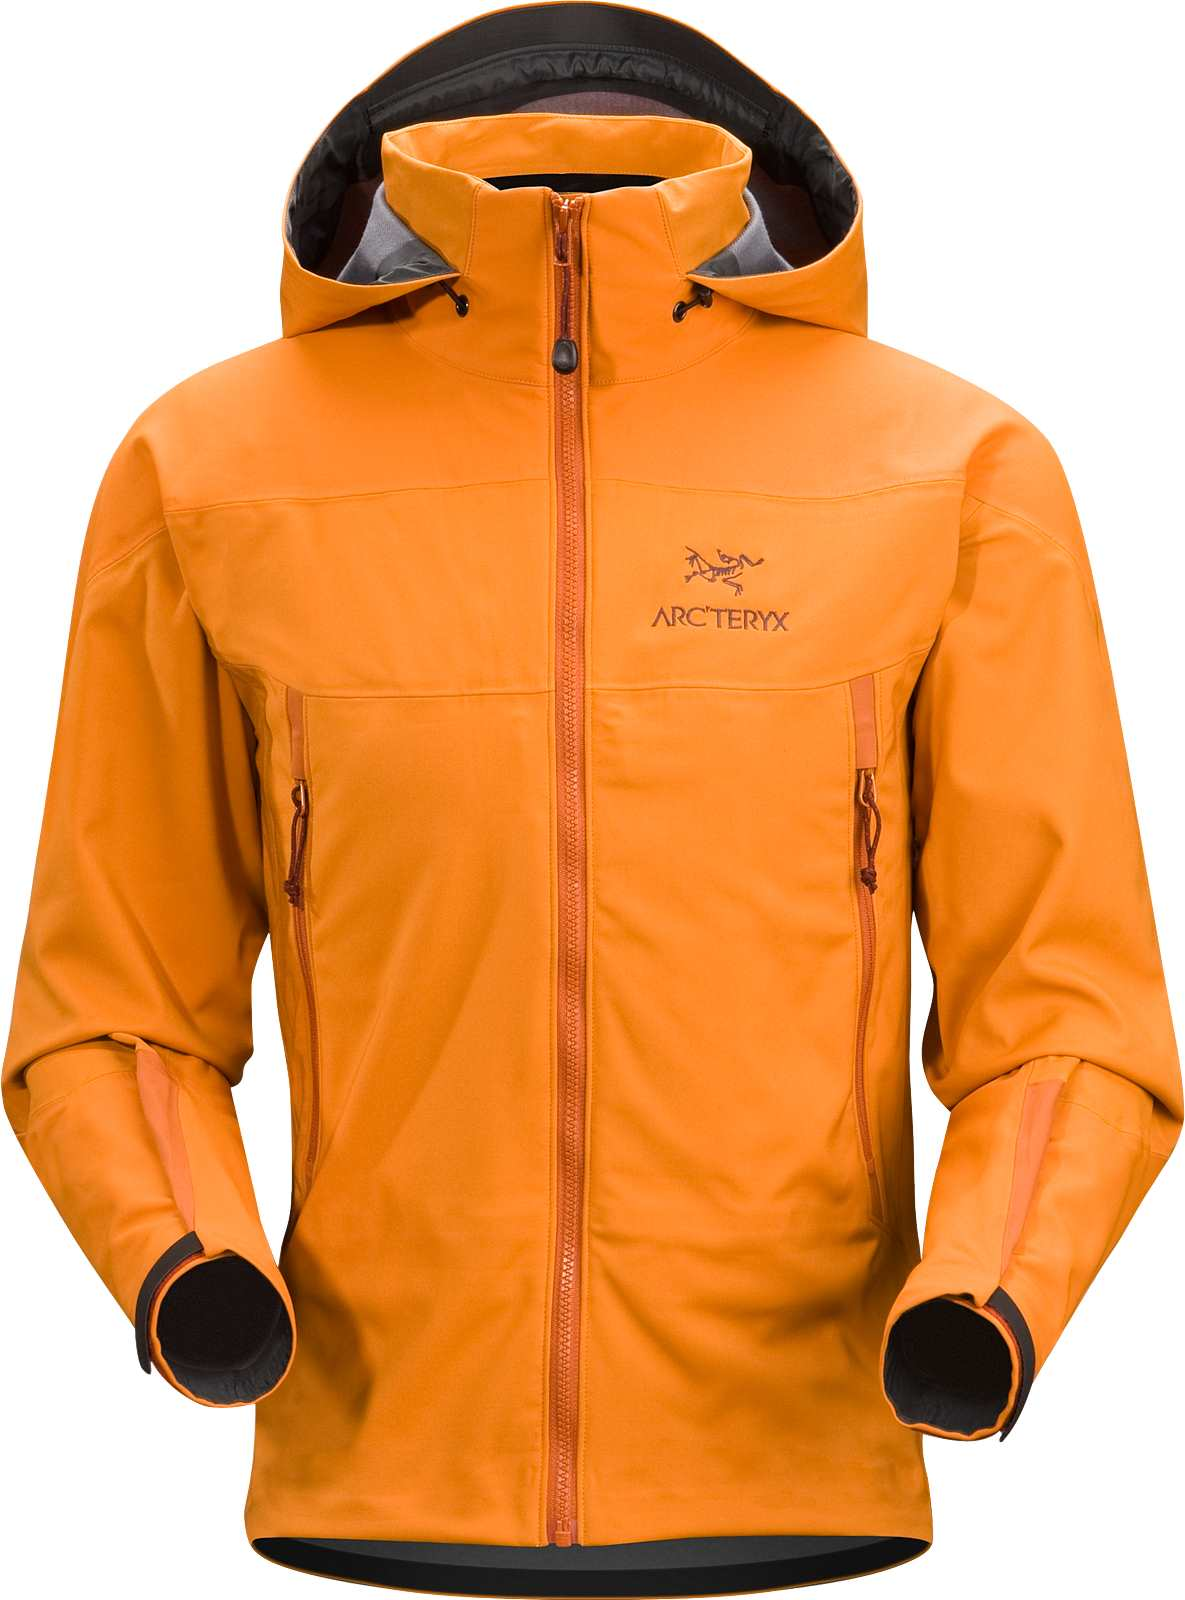 New Arc'Teryx Mens Venta SV Hooded Jacket , Copper, Medium, 6247